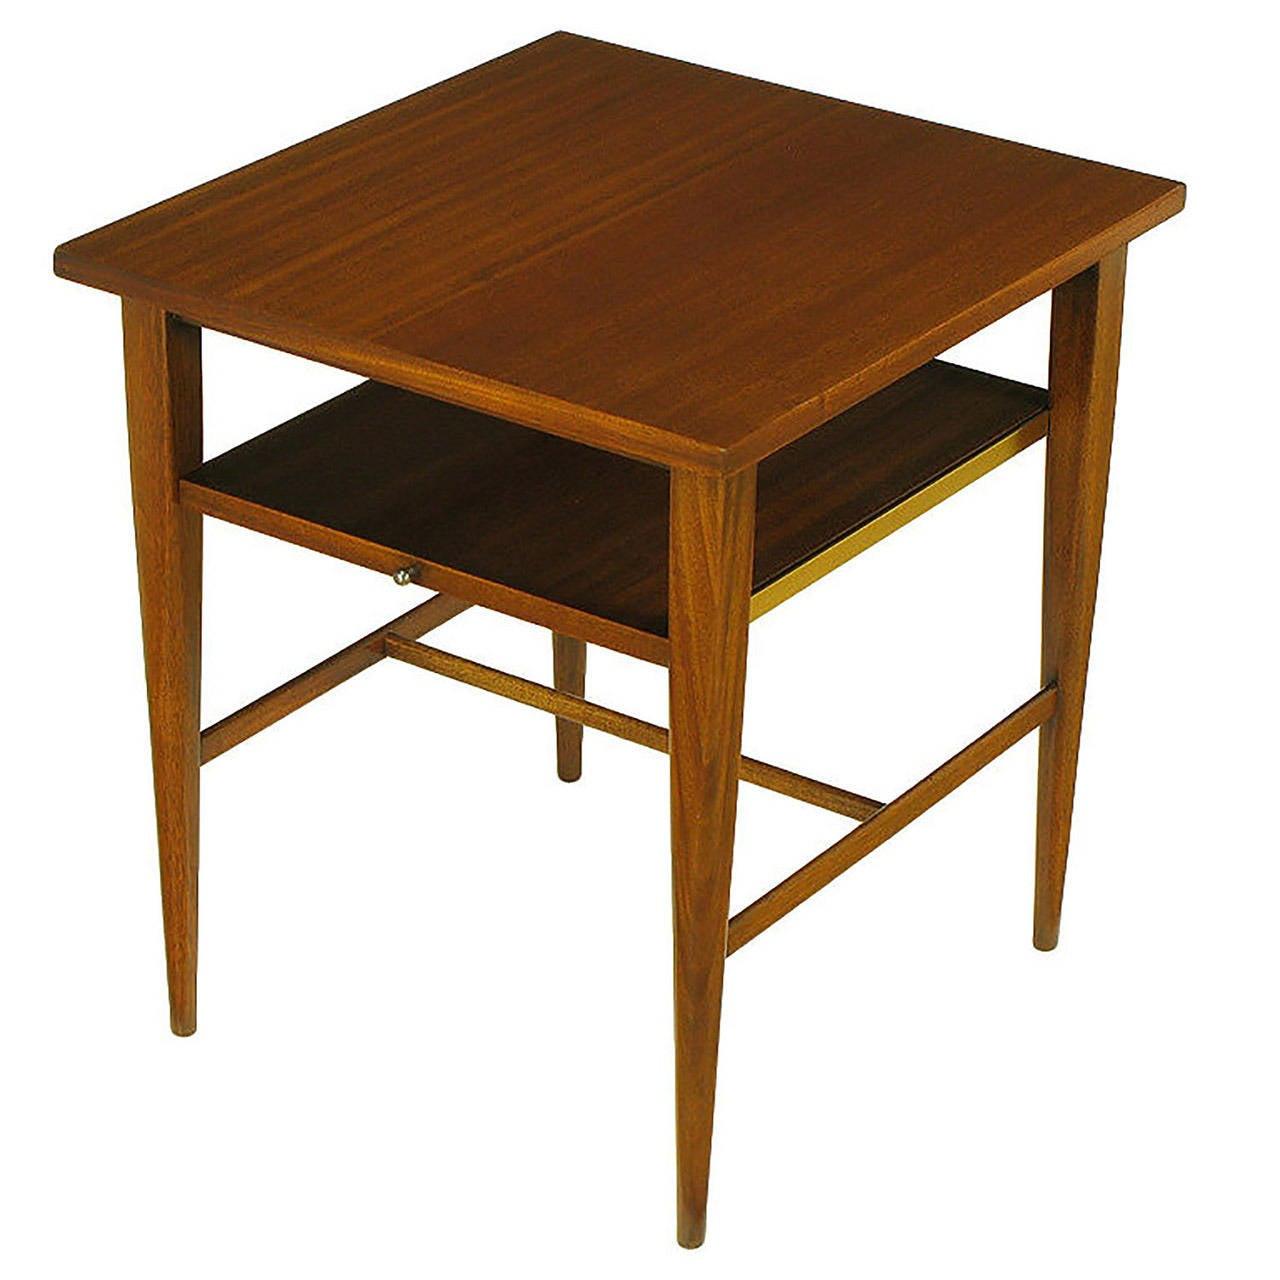 Paul McCobb Ribbon Mahogany End Table with Extensible Shelf at 1stdibs